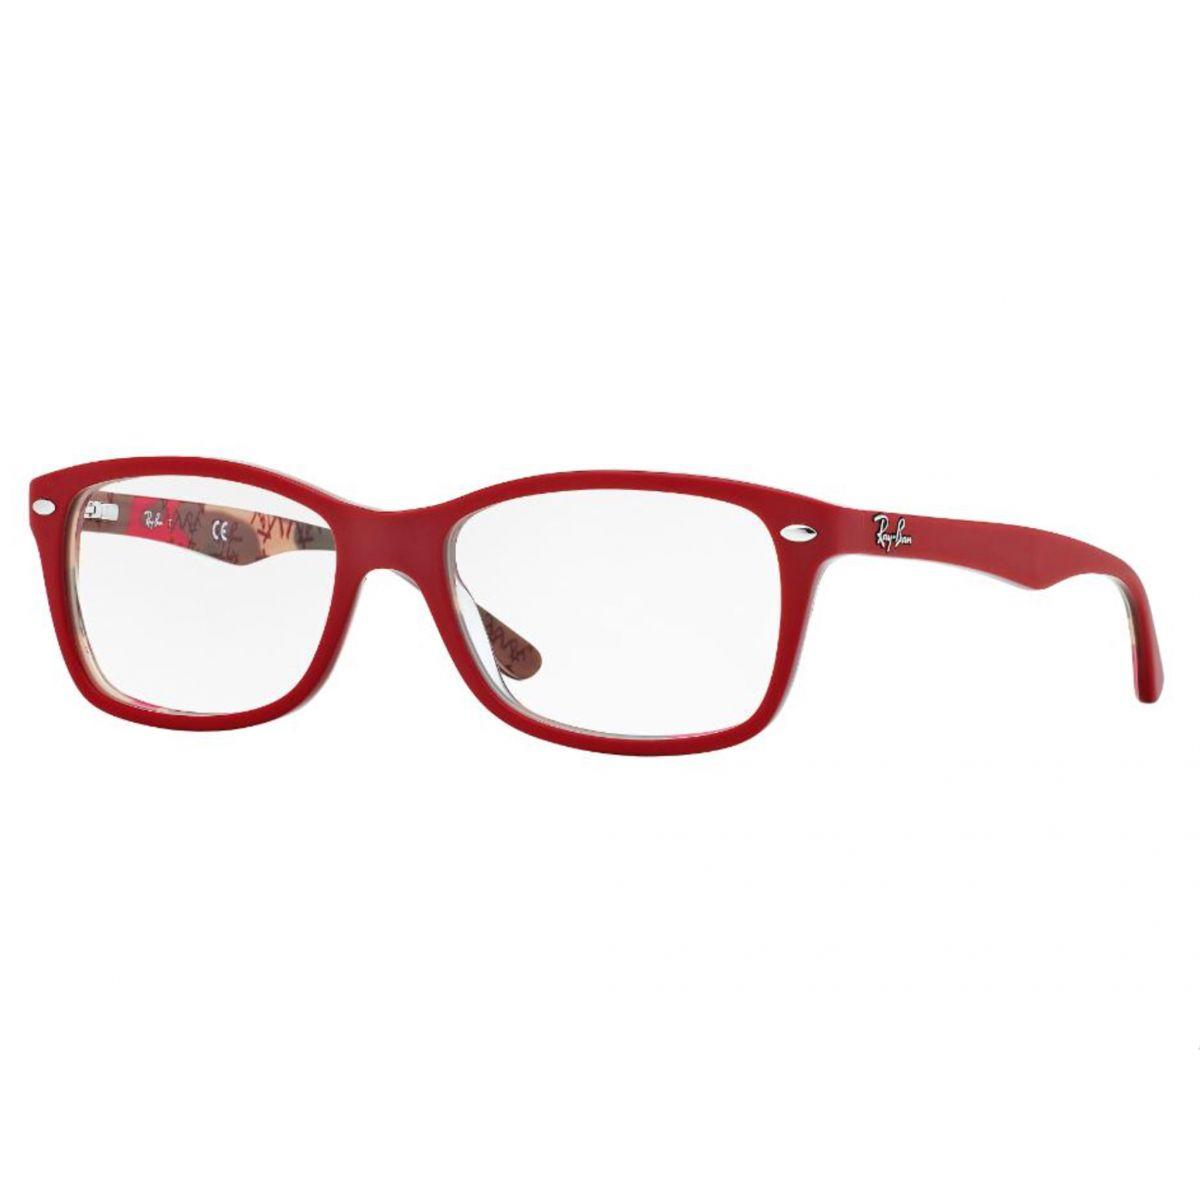 c6a73693c Otica Online Oculos De Grau | www.tapdance.org